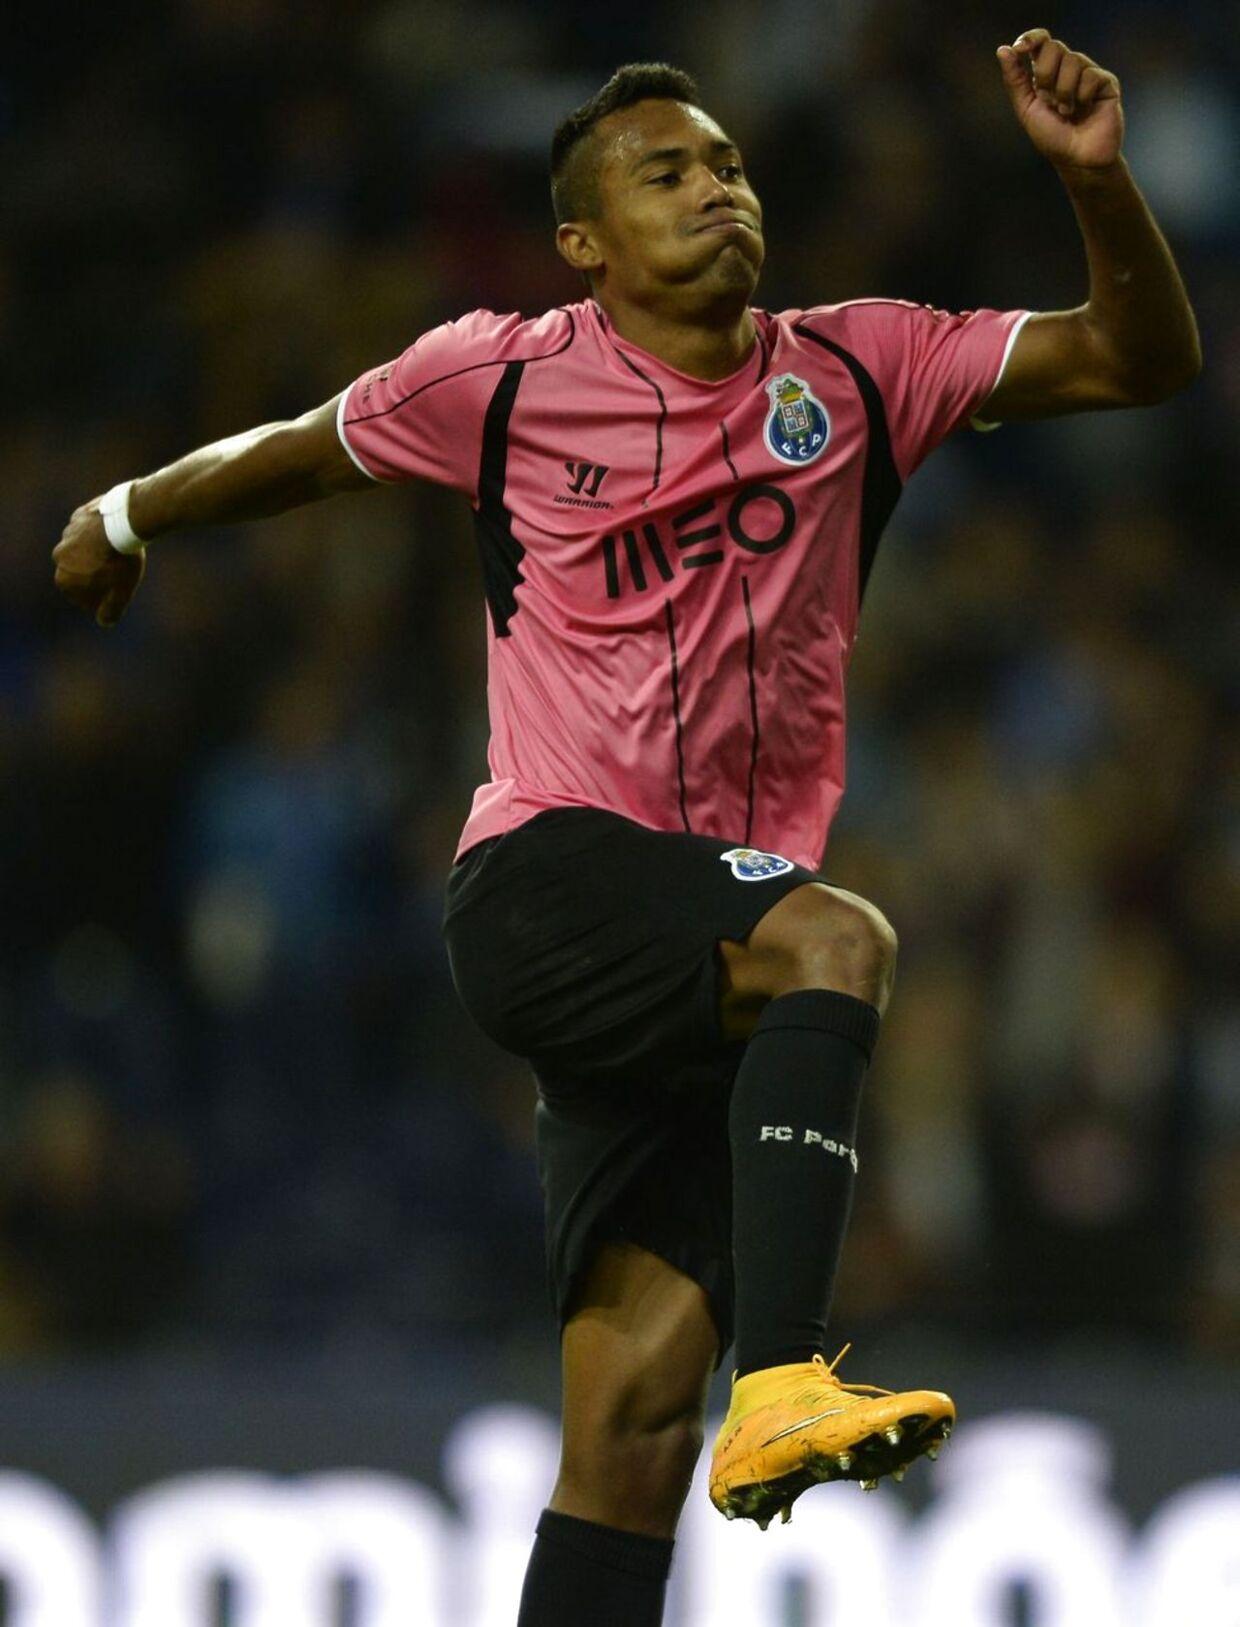 Brasilianske Alex Sandro jubler efter en scoring for sit klubhold FC Porto.